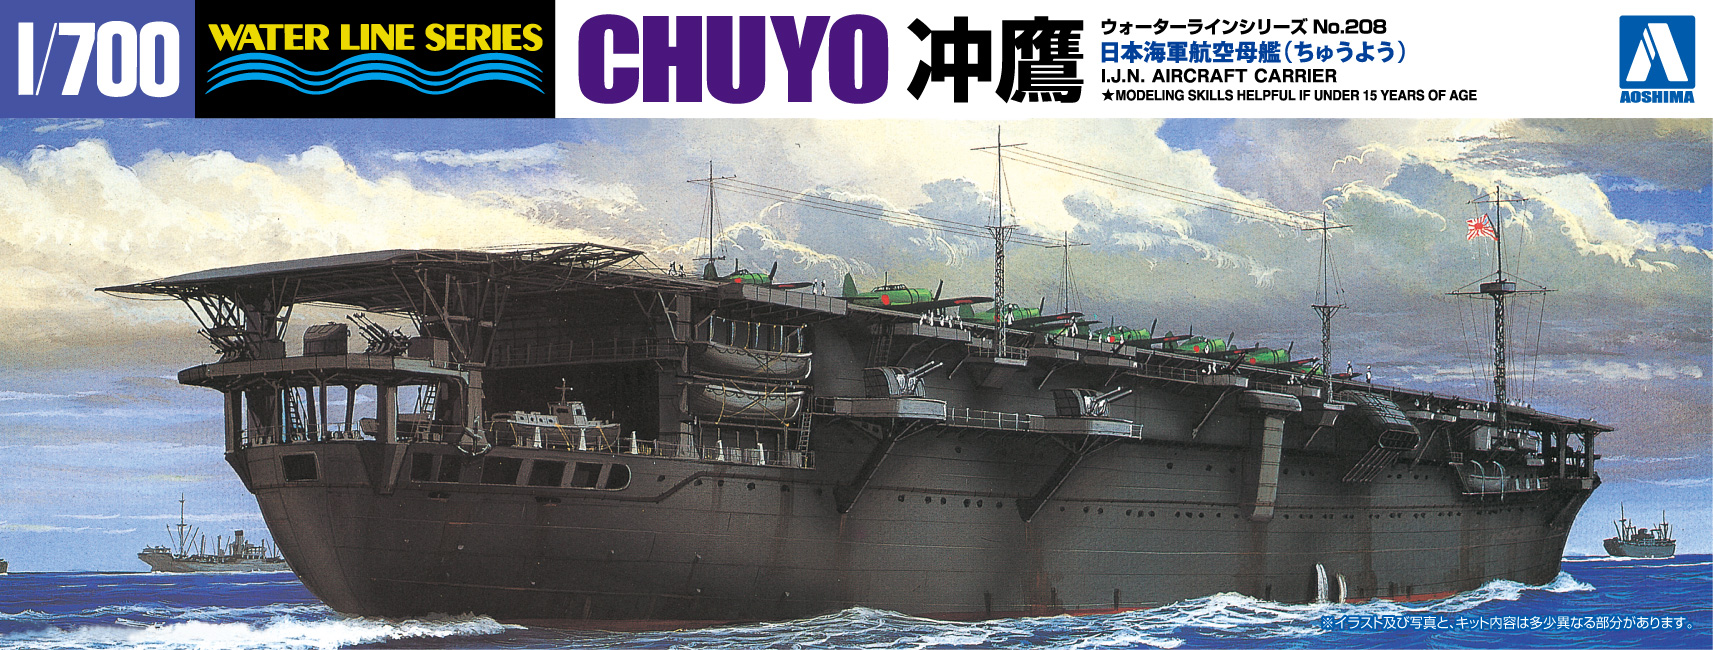 Aoshima 1/700 I.J.N. AIRCRAFT CARRIER CHUYO